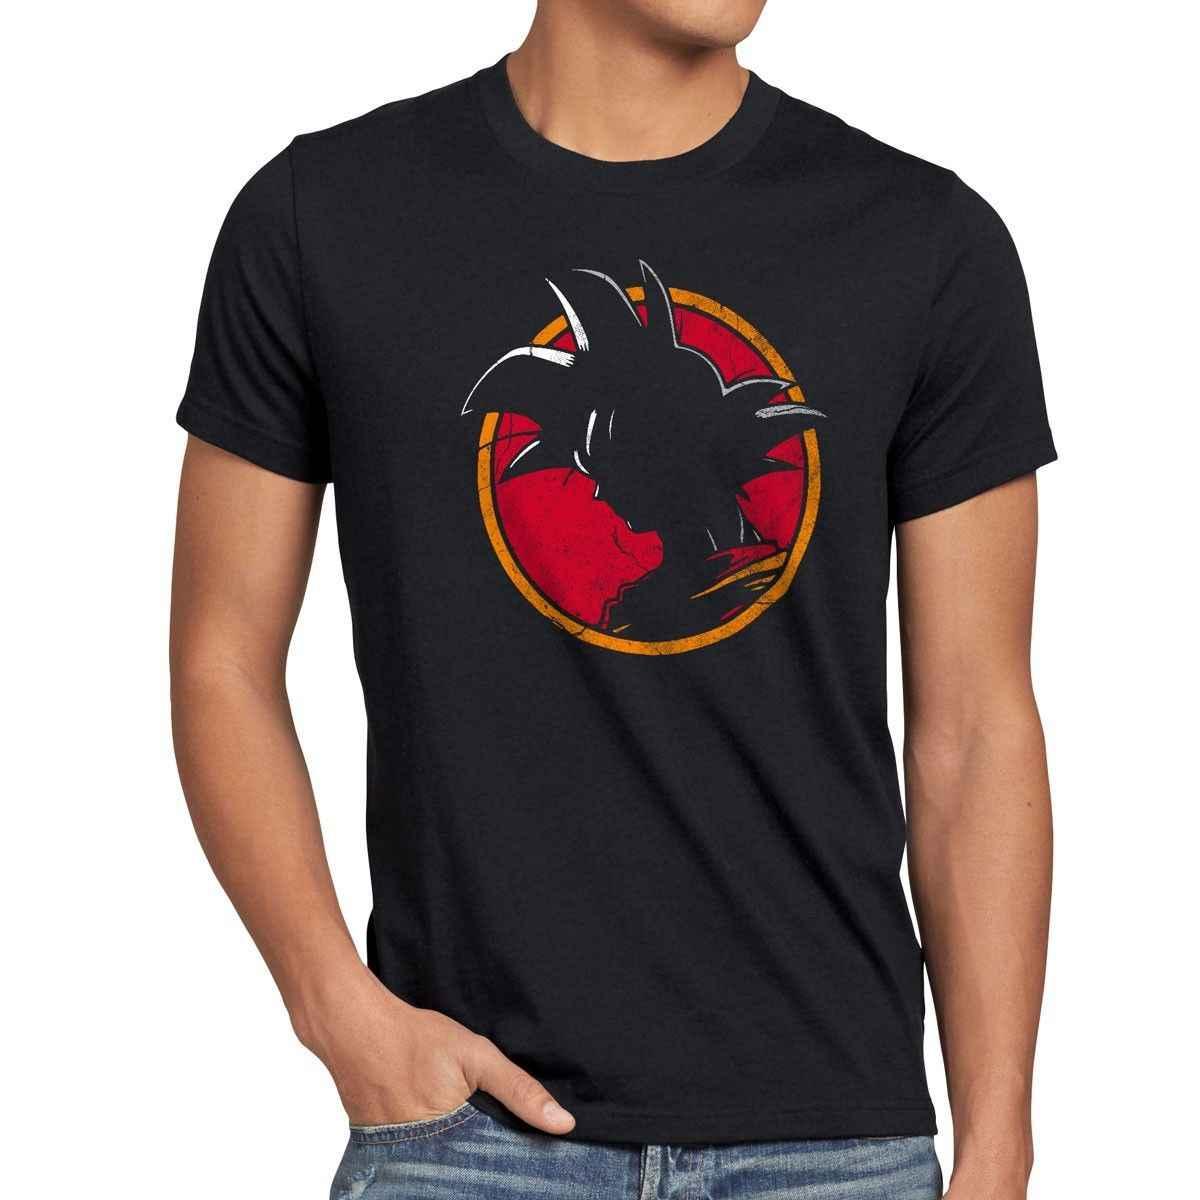 Goku/Винтажная Футболка Herren saiyajin roshi son dragon-ball Аниме z goten krillin Удобная футболка Повседневная футболка с короткими рукавами